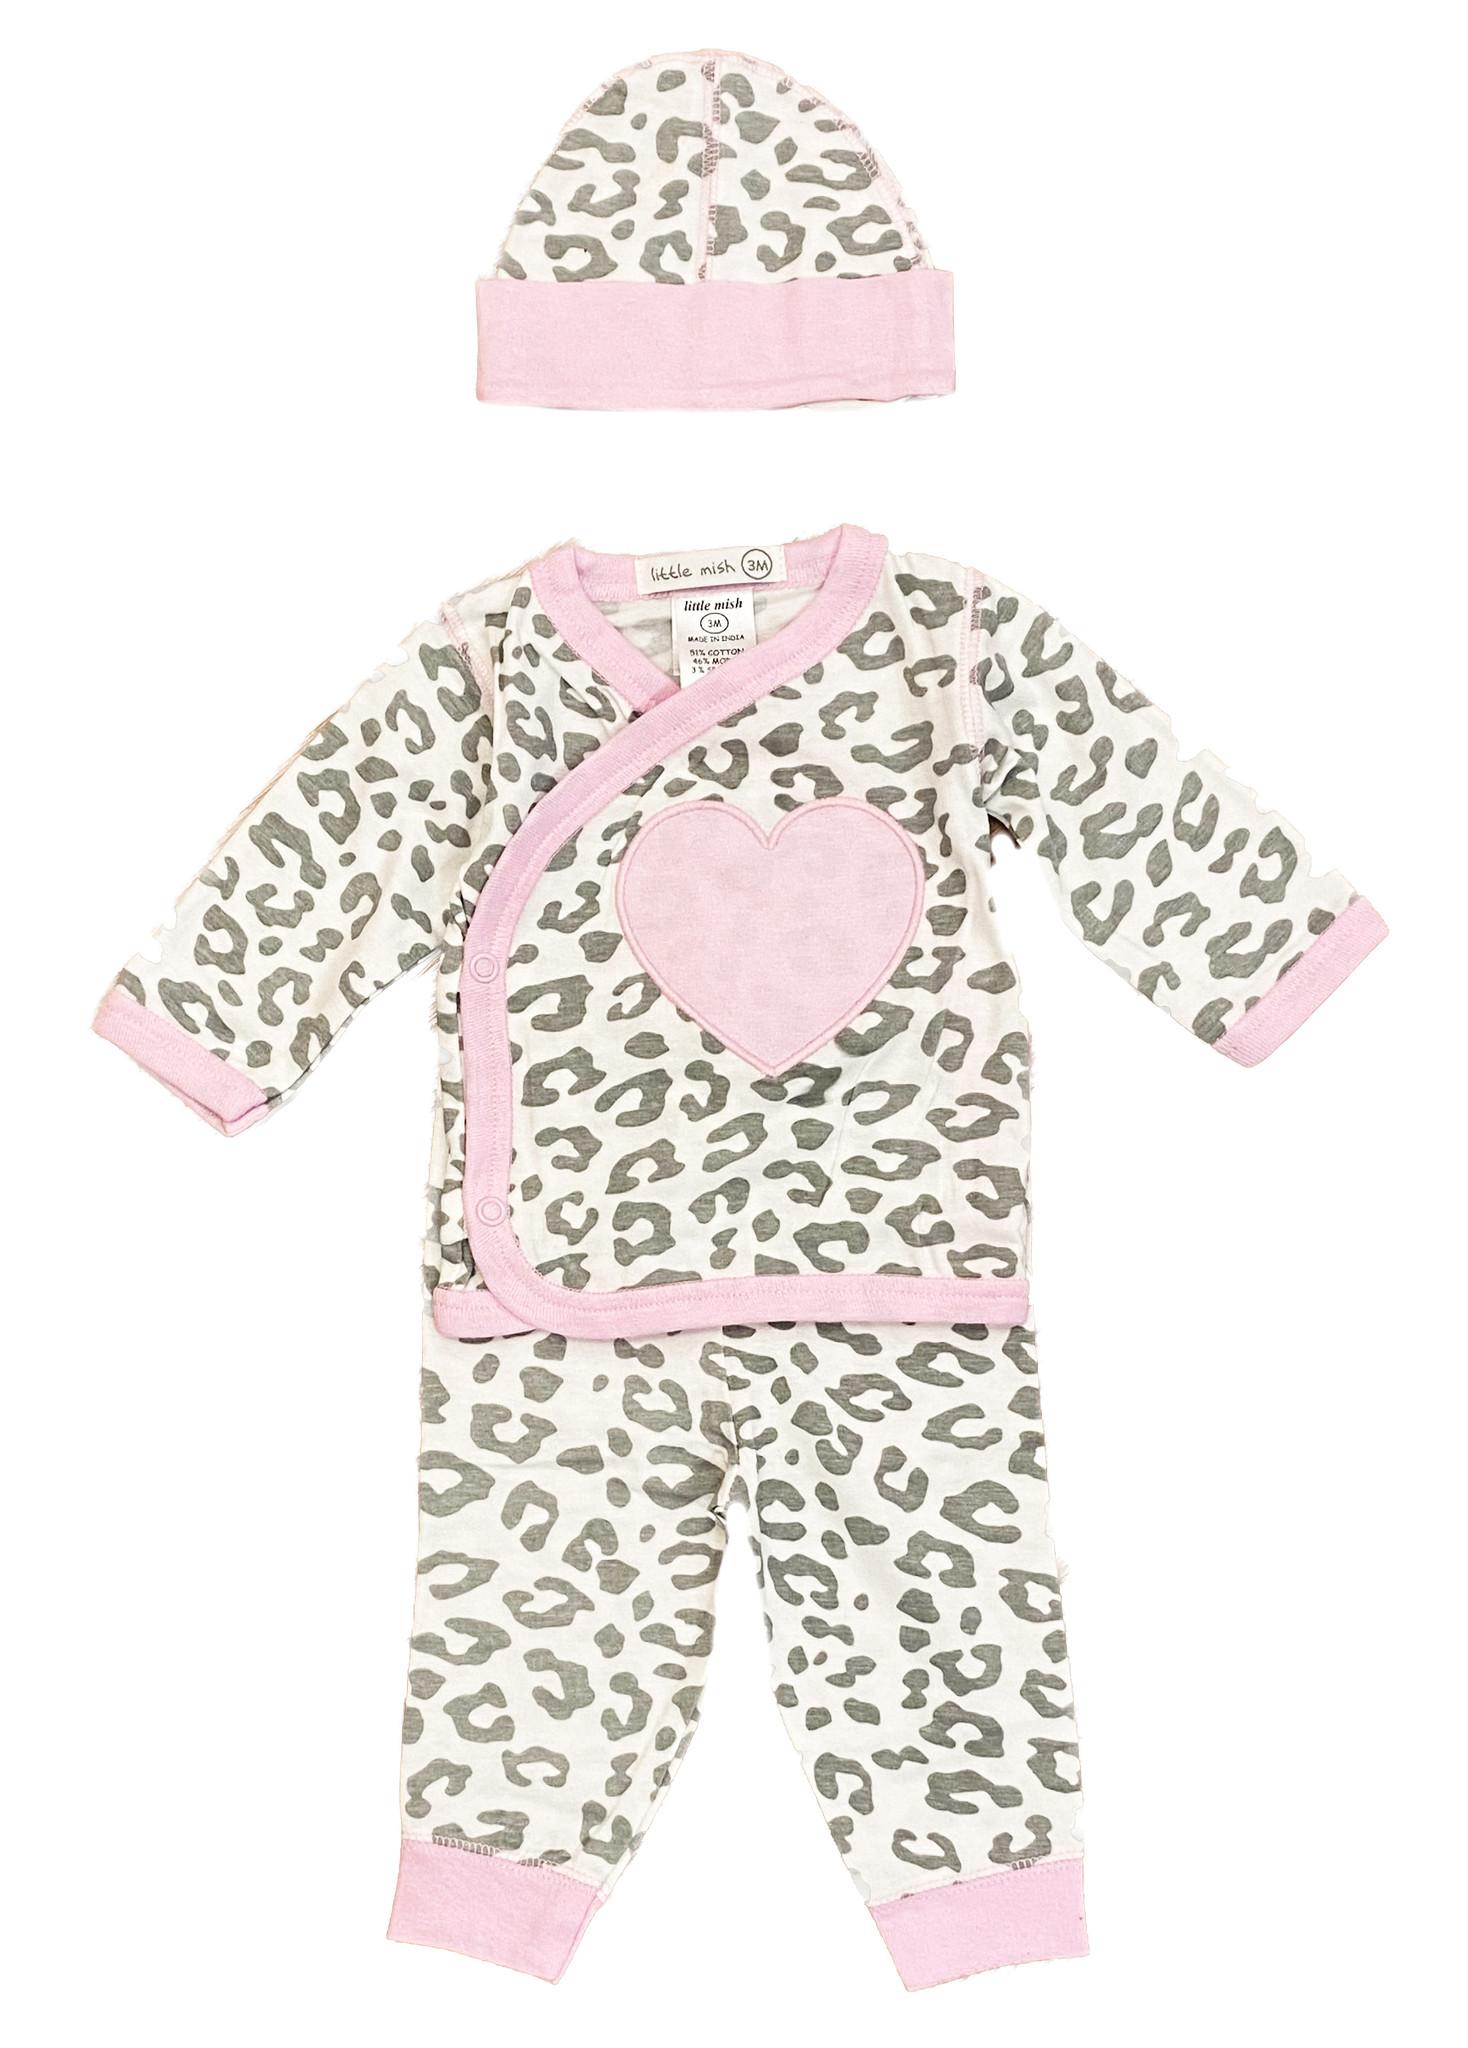 Little Mish White Cheetah 3 Pc Set